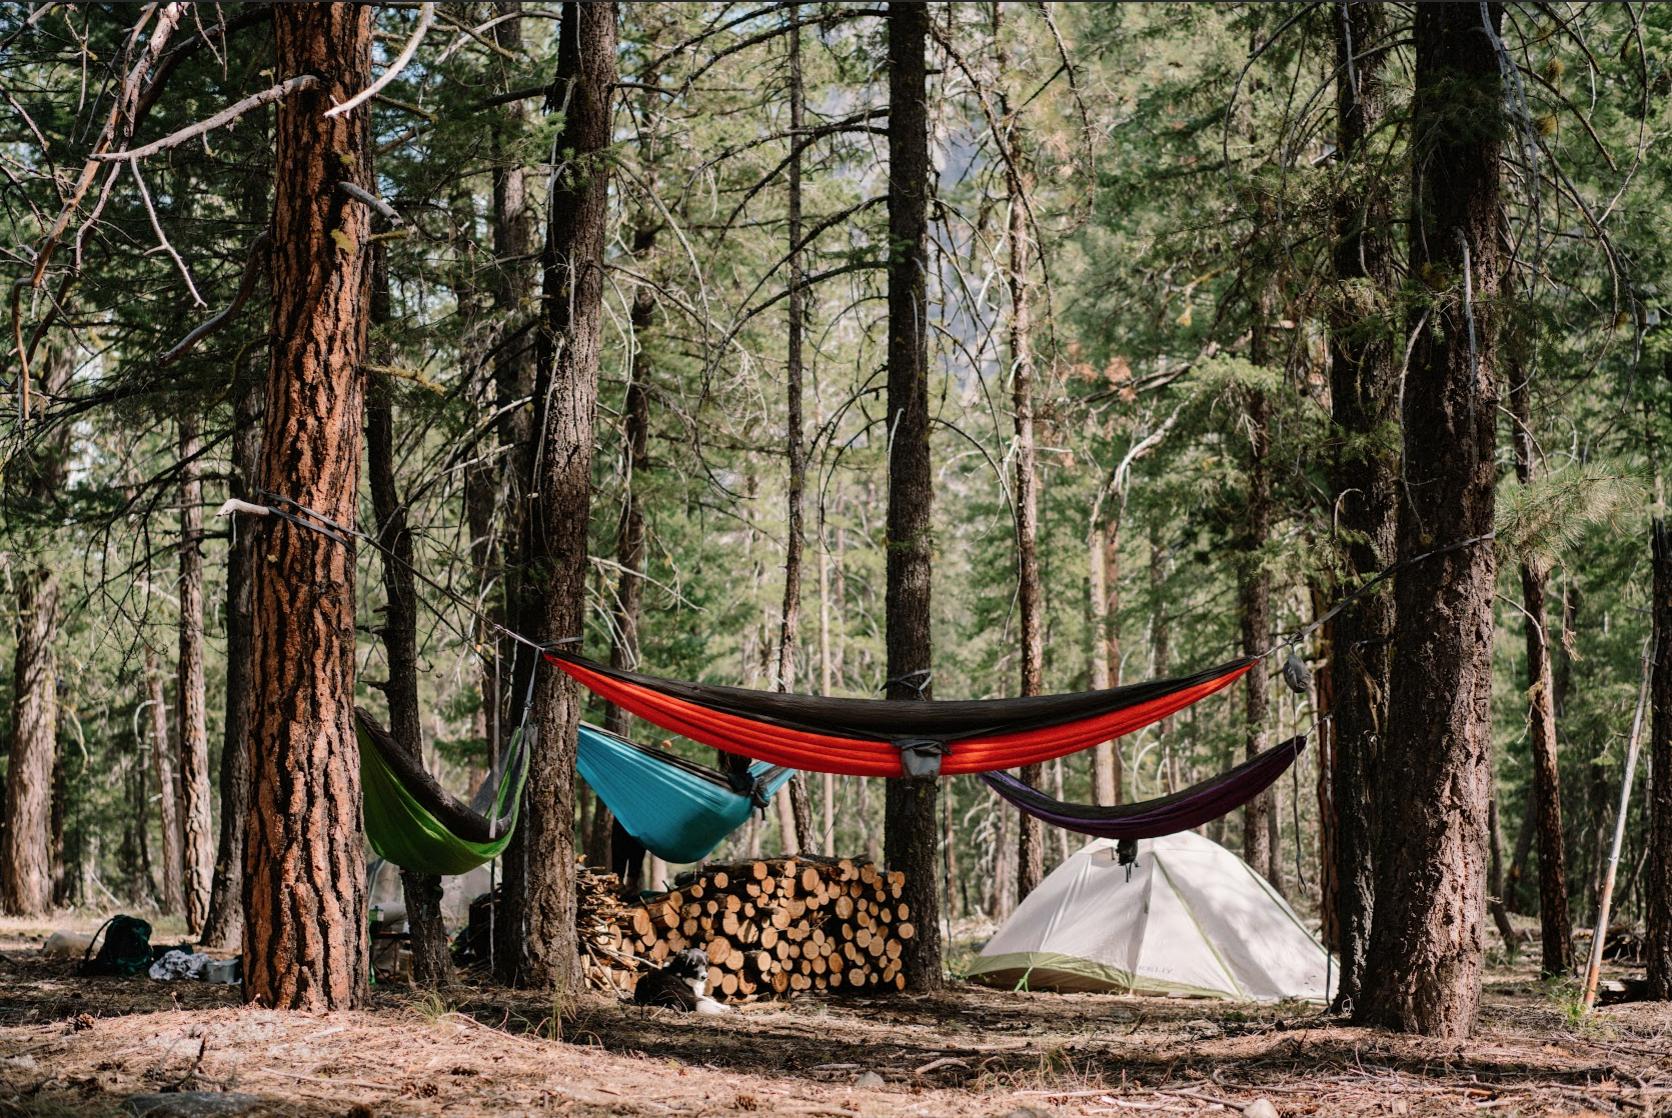 Roo camping hammock camping places and hiking